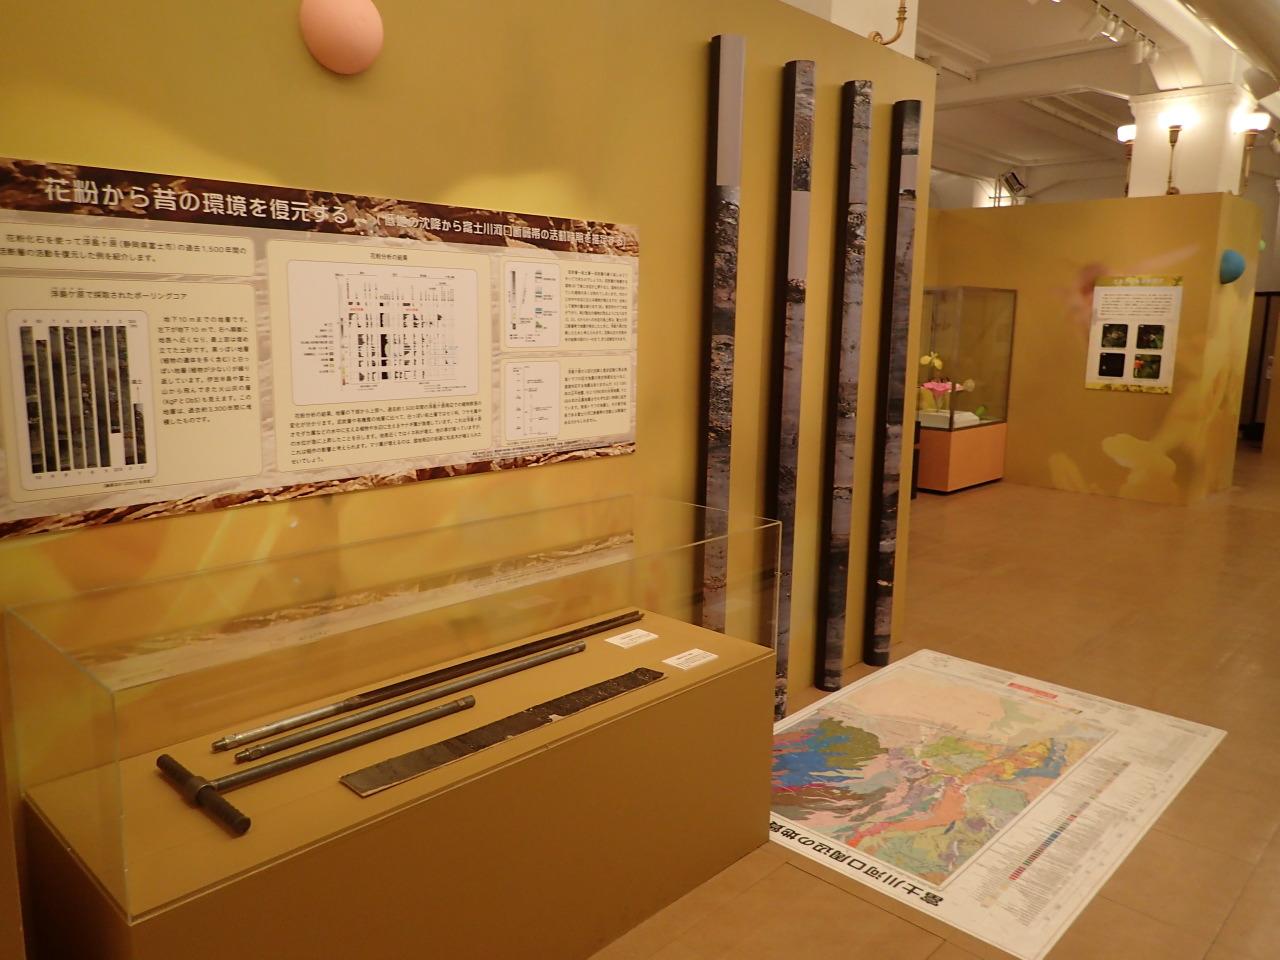 国立科学博物館「花粉と花粉症の科学」展